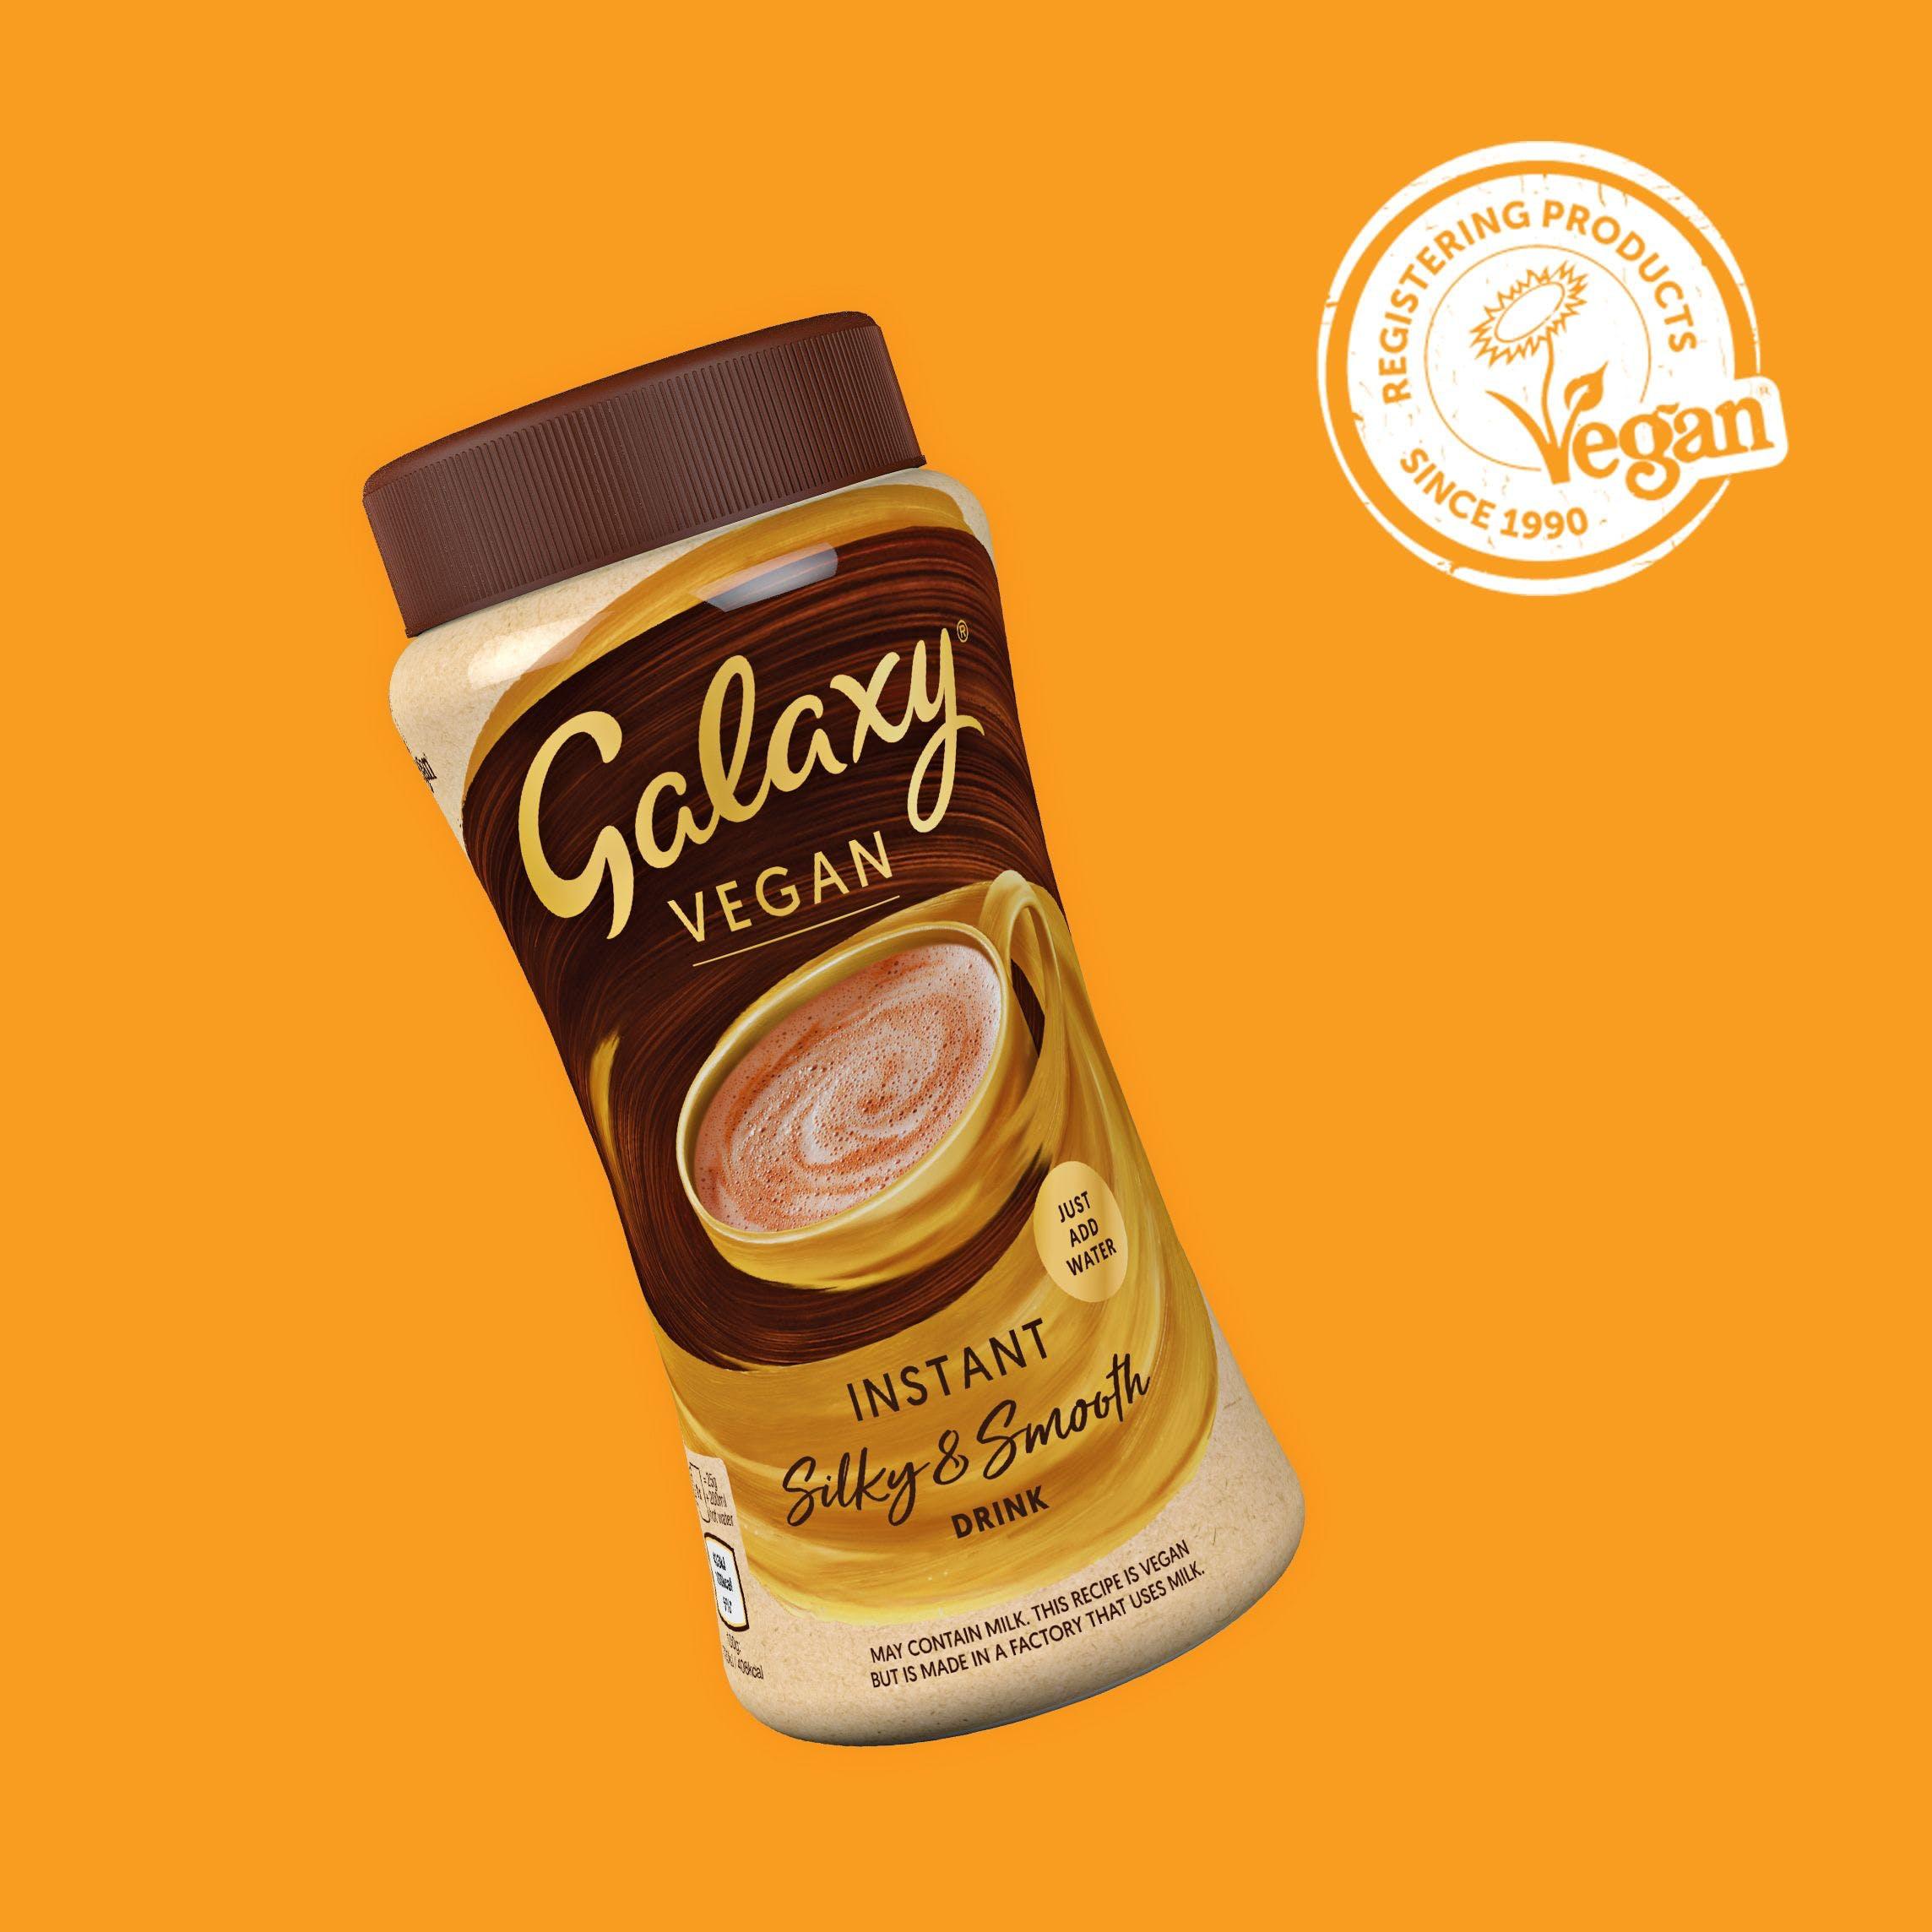 galax vegan hot chocolate powder